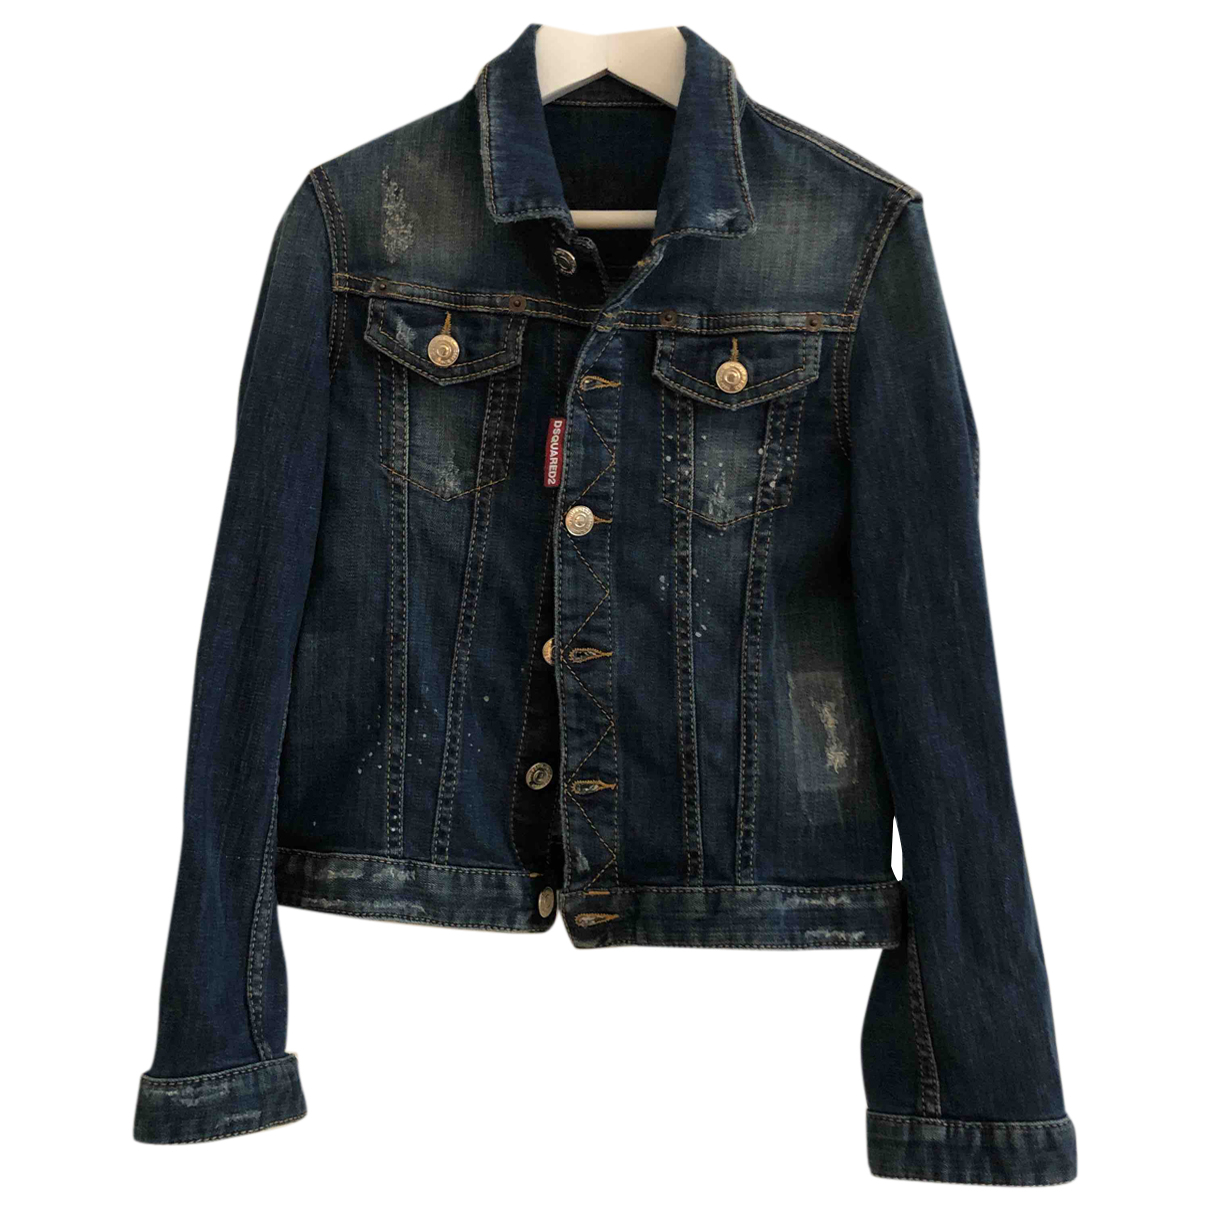 Dsquared2 N Blue Denim - Jeans jacket & coat for Kids 10 years - up to 142cm FR